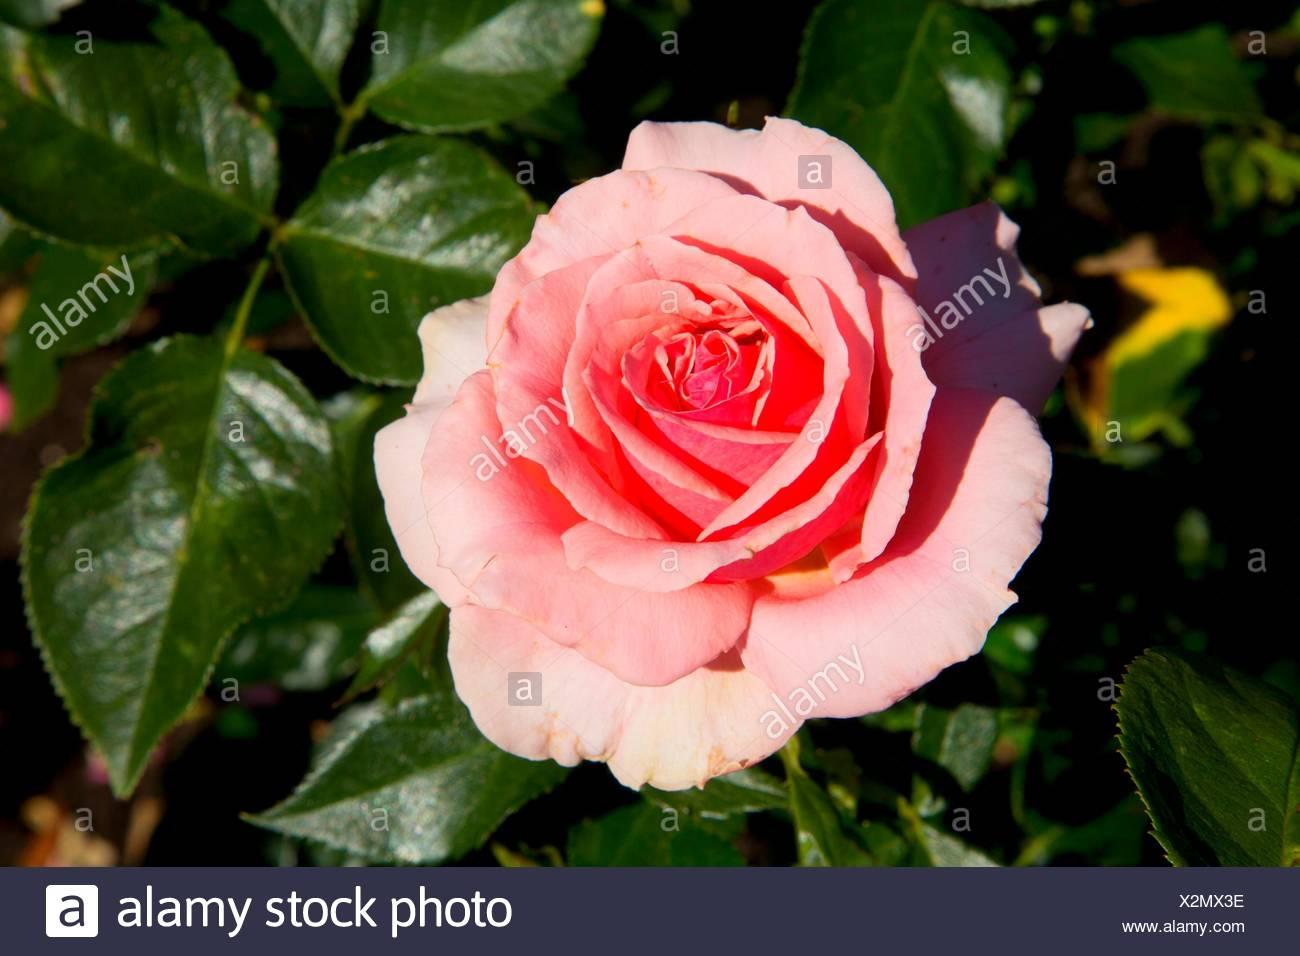 Tournament of Roses rose, Heirloom Roses, St Paul, Oregon. - Stock Image